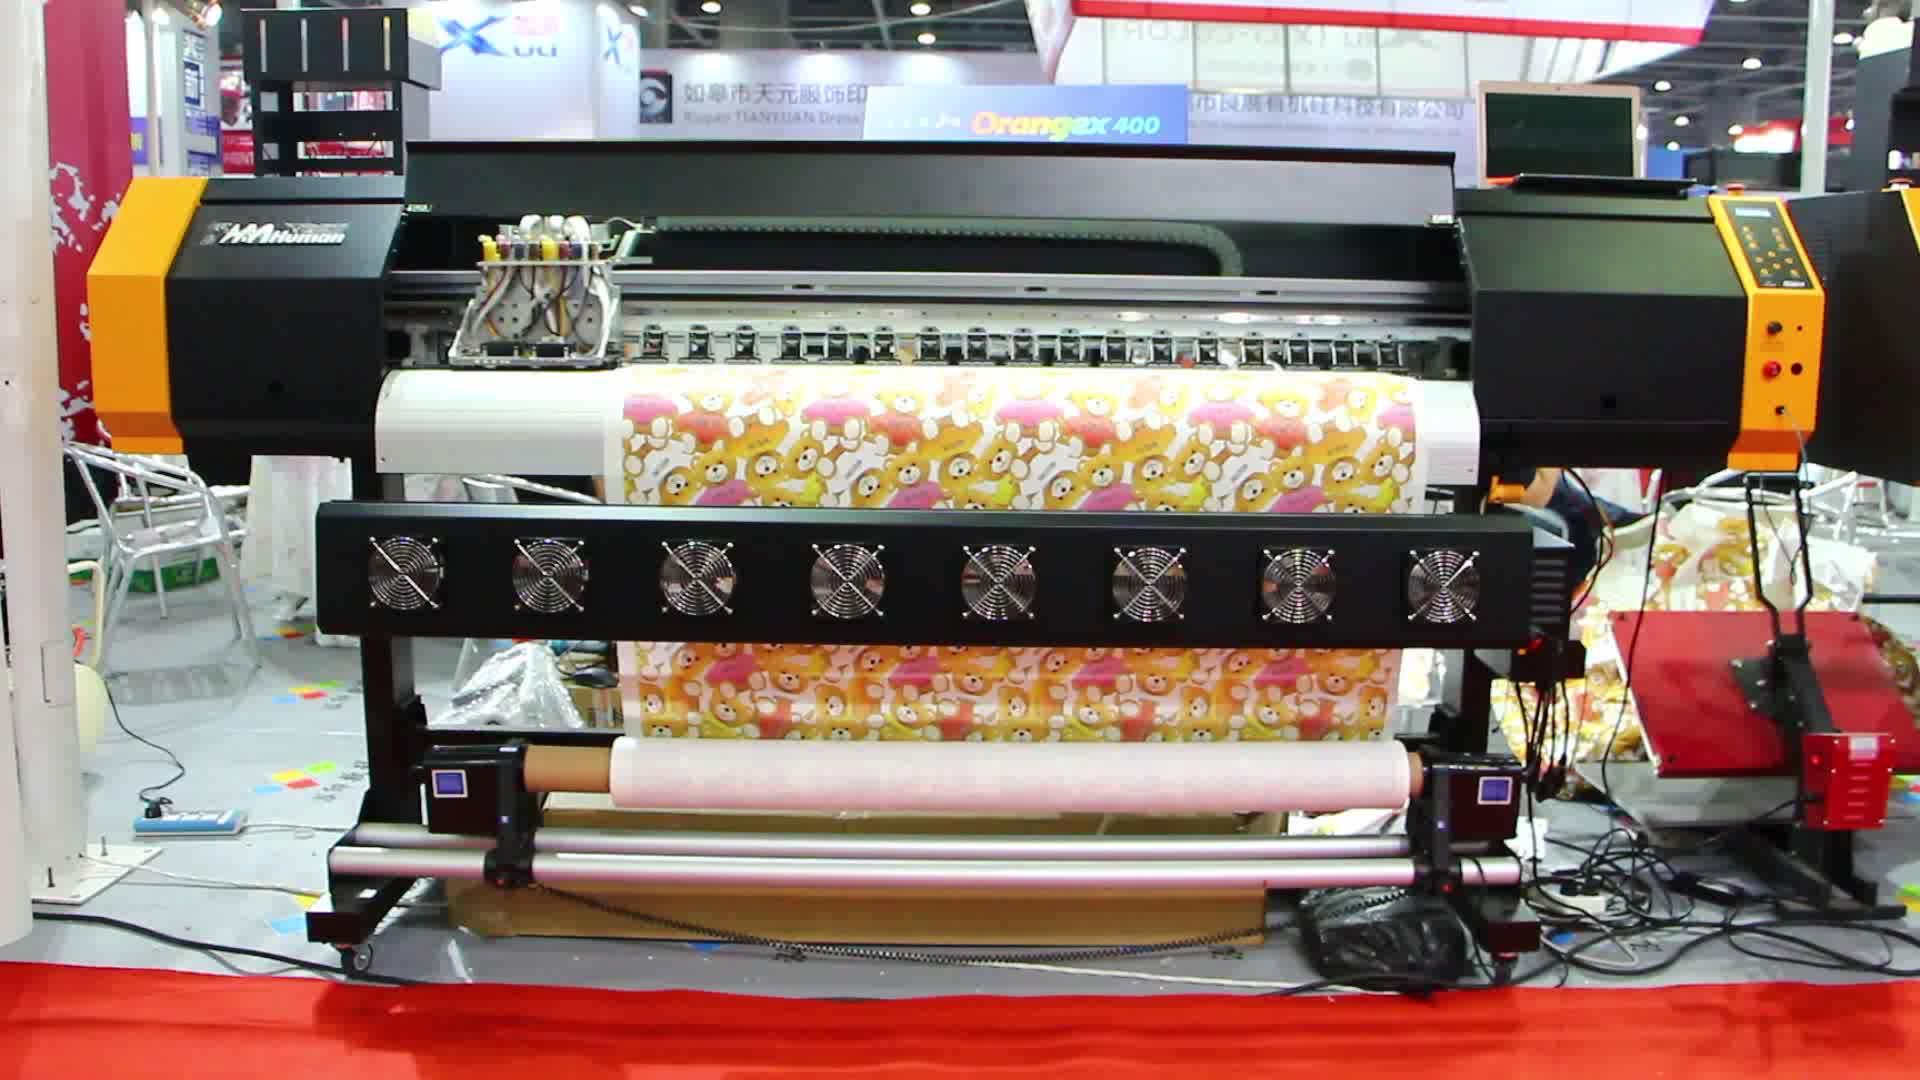 Hongink Human Digital Textile Printer E-jet V25 ...